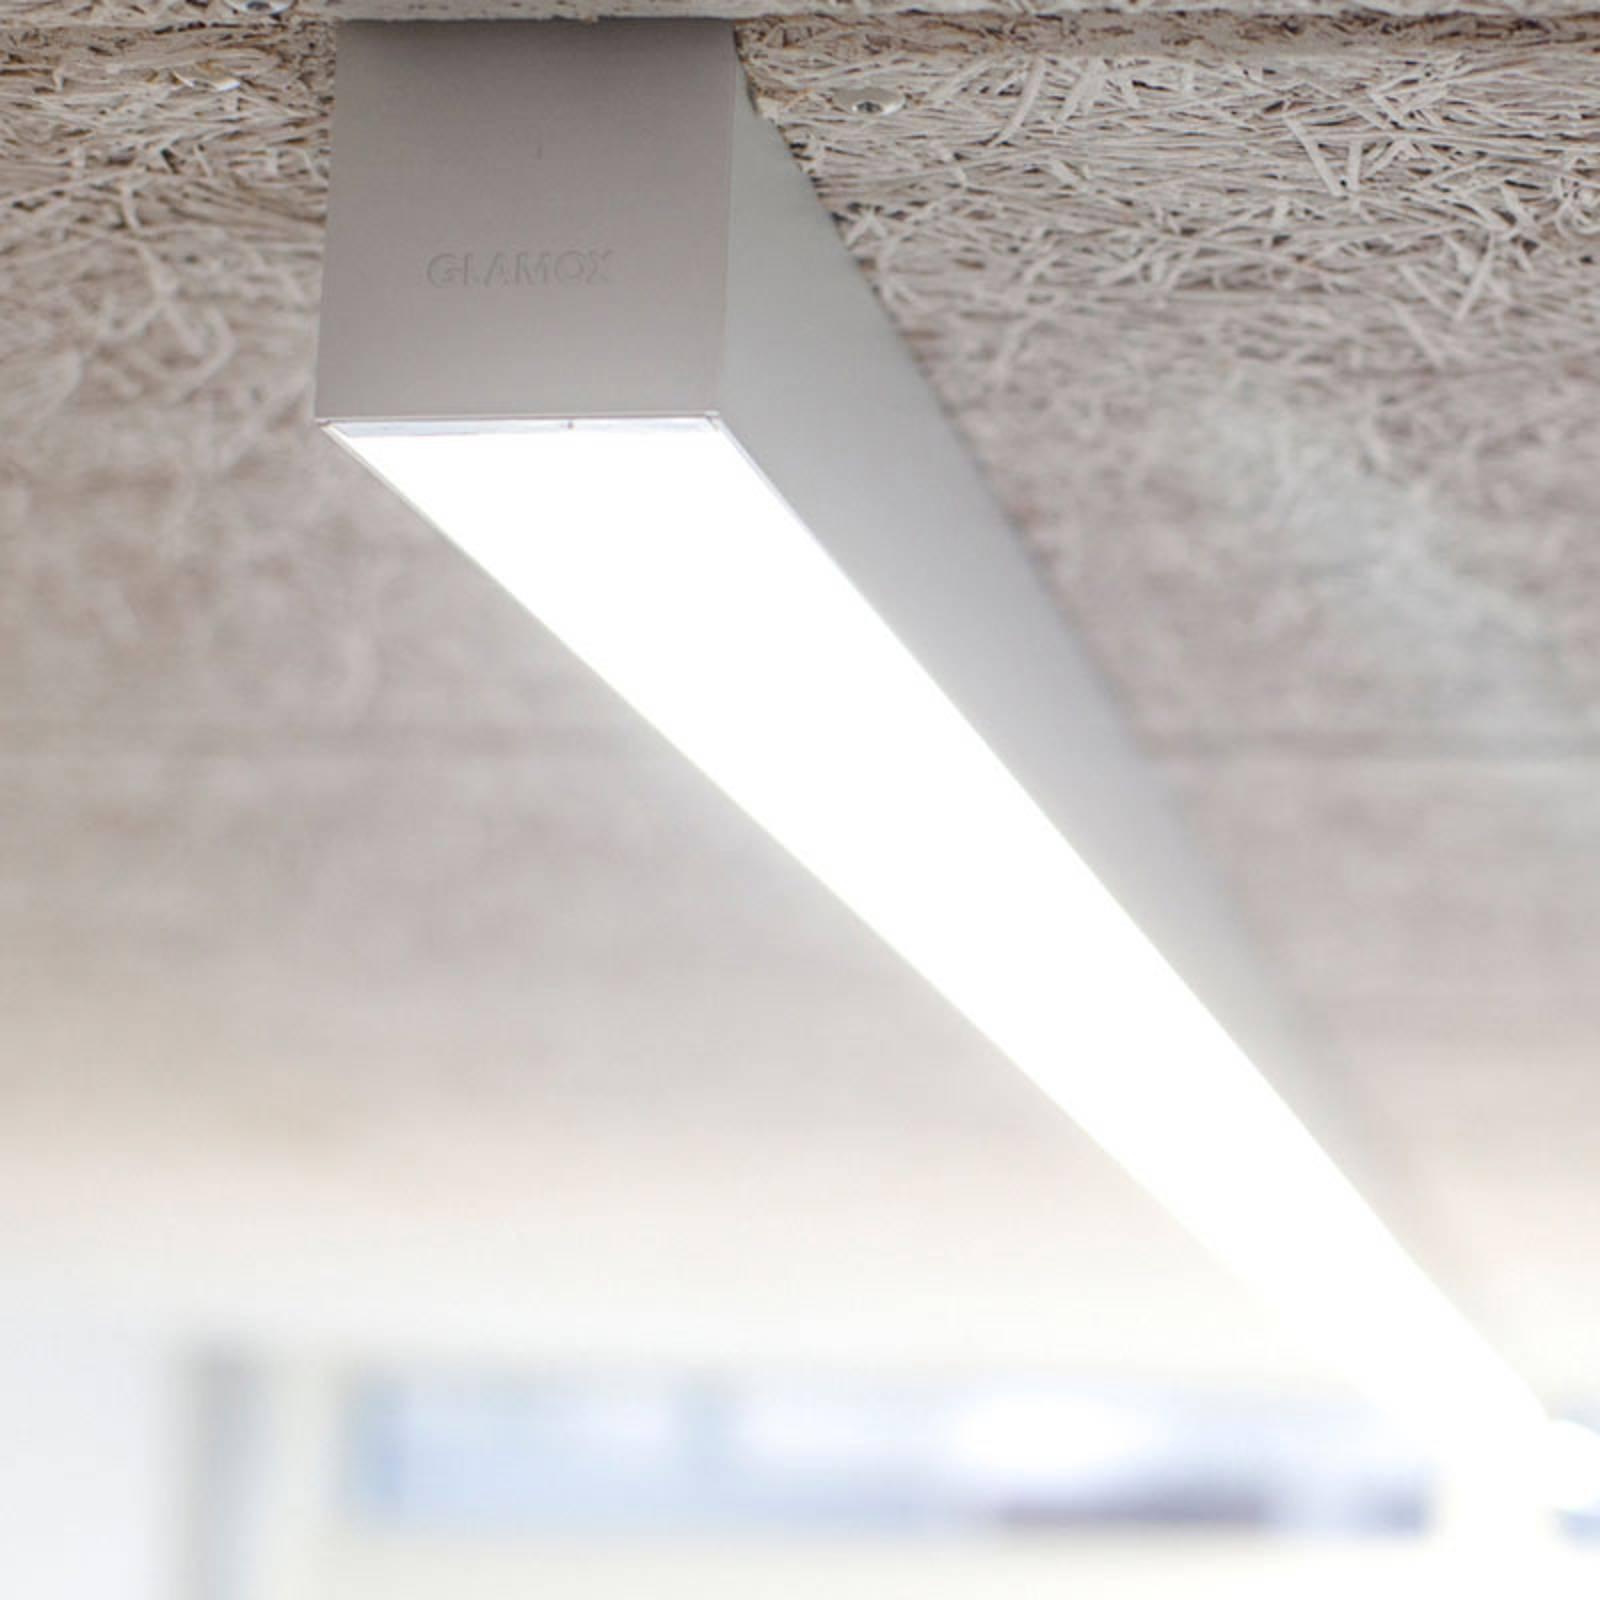 LED-kattovalaisin C80-SR HF 830 2520 lm, 141 cm